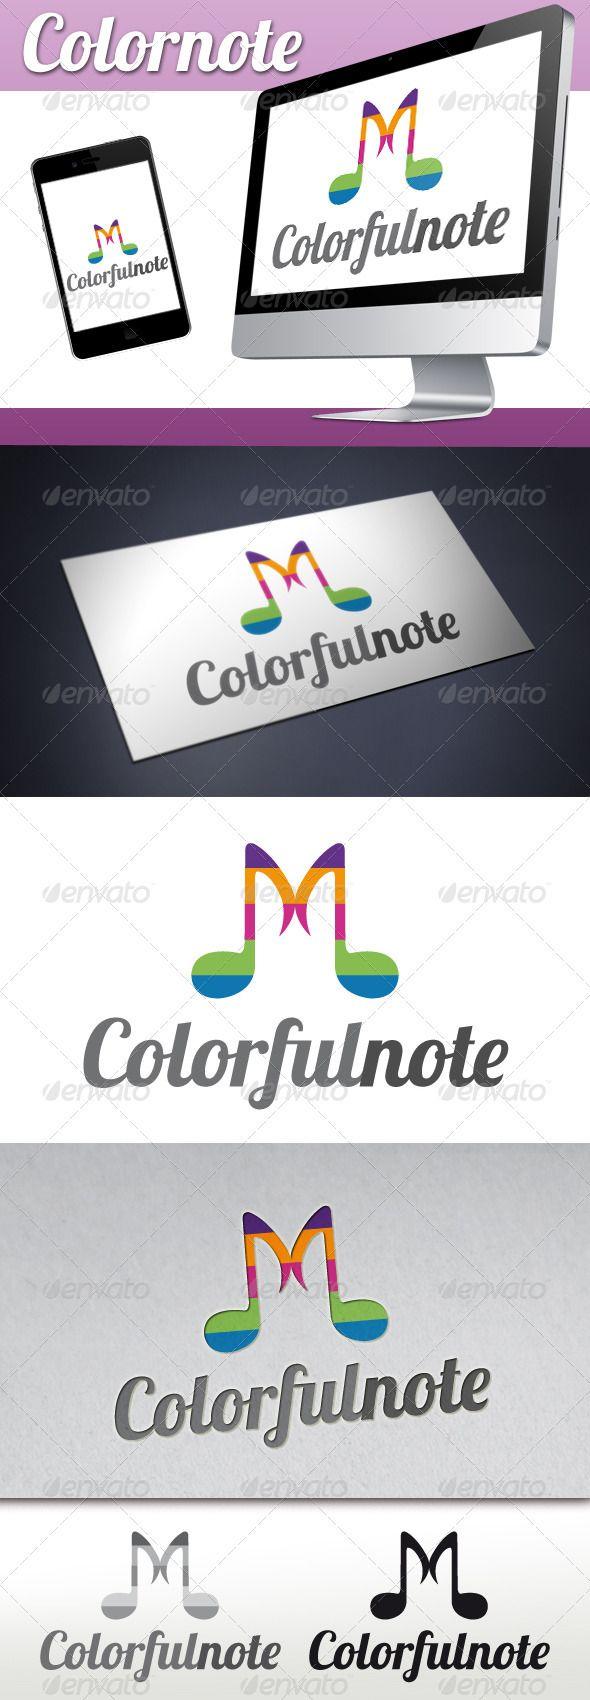 Pin by Bashooka Web & Graphic Design on Music Logo